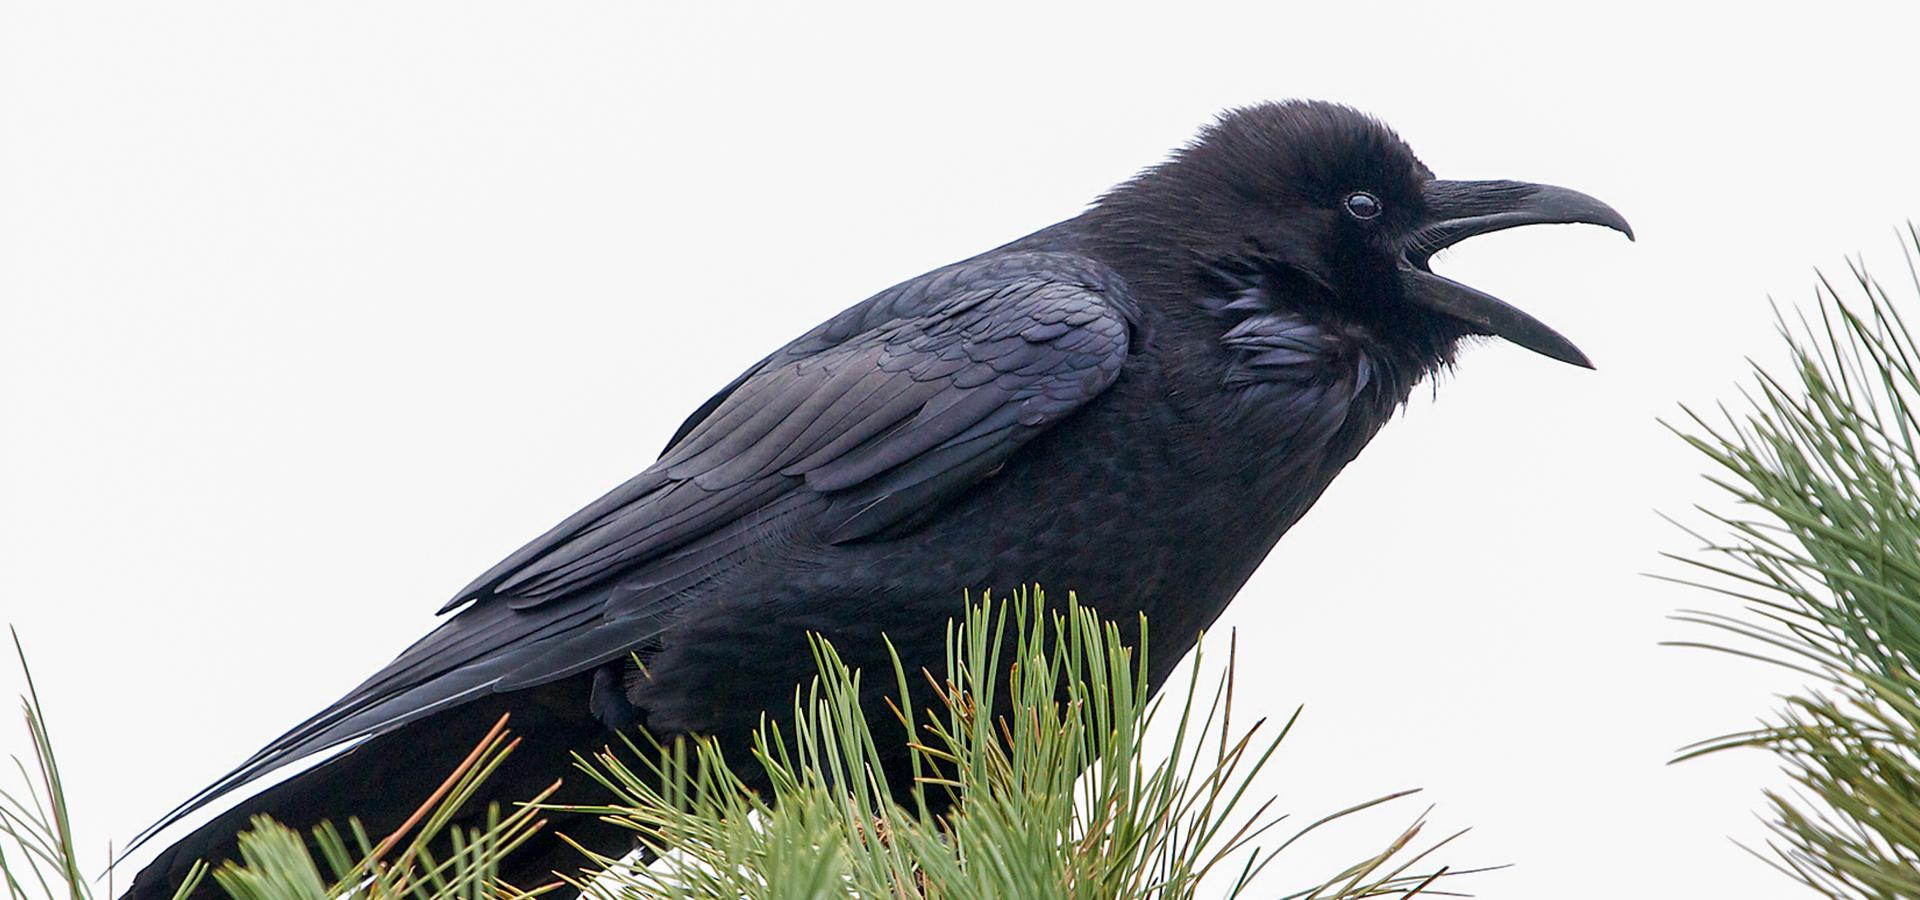 Ruffled Feathers Book Club: Mind of the Raven | Travis Audubon Ruffled Feathers Sanctuary